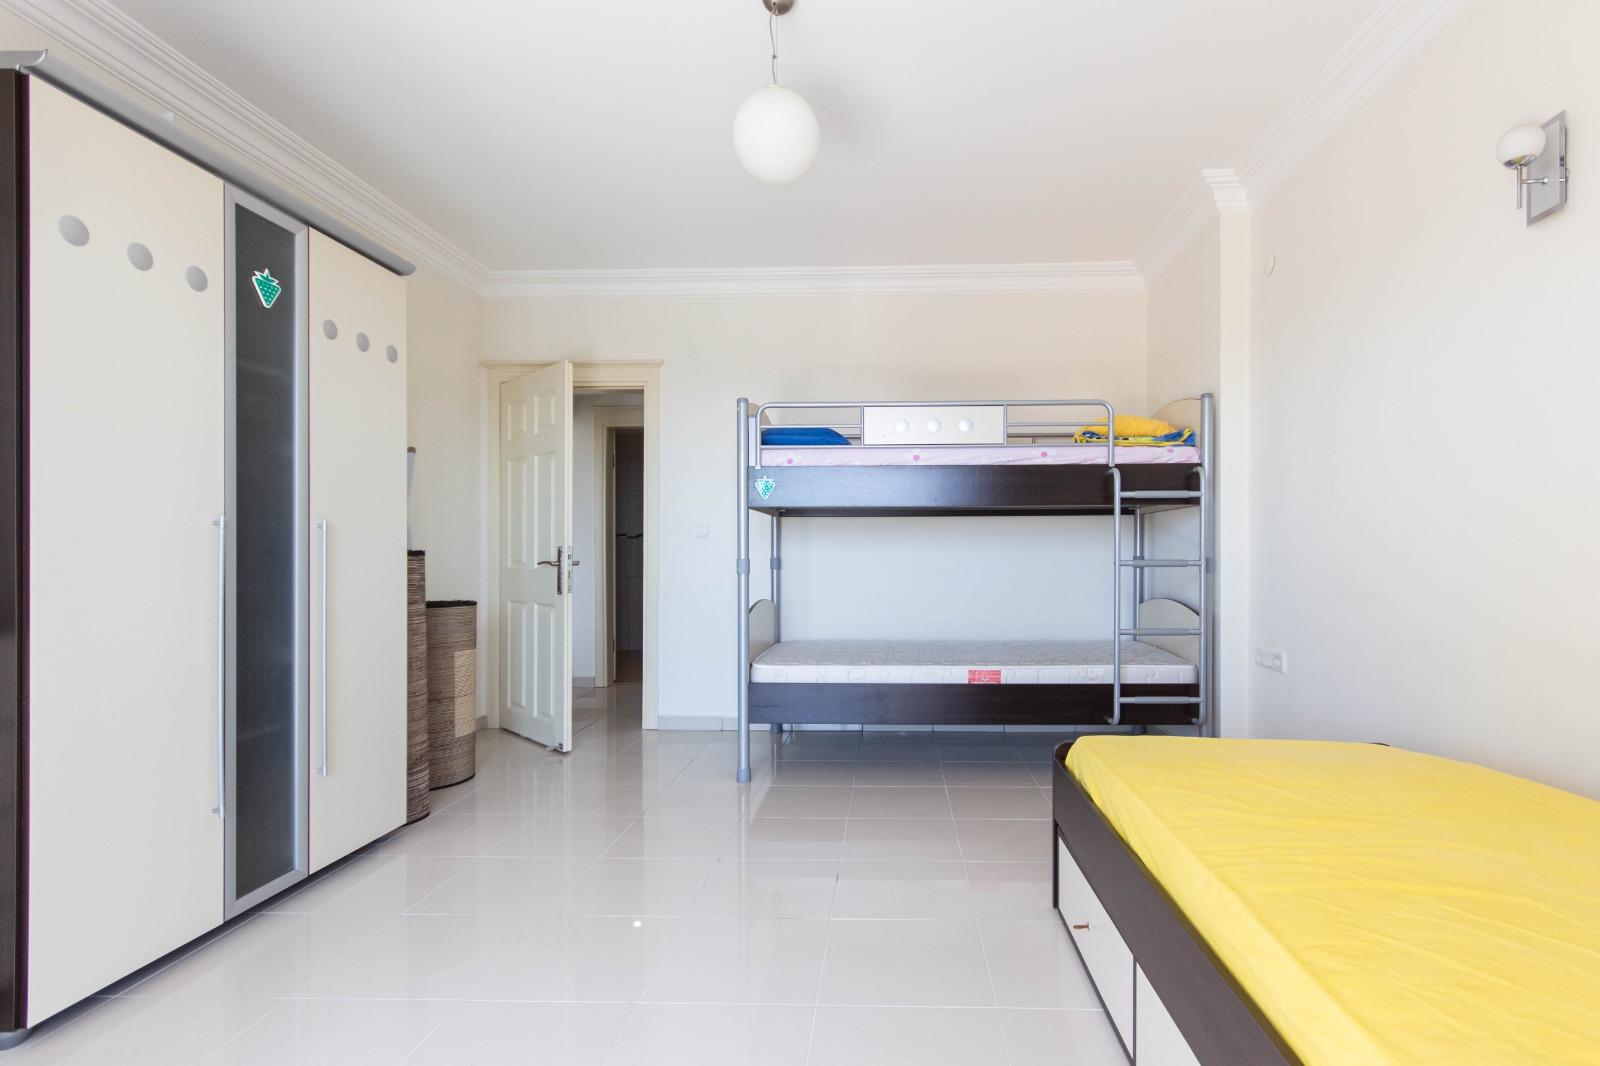 Меблированная квартира 2+1 с видом на море. - Фото 25